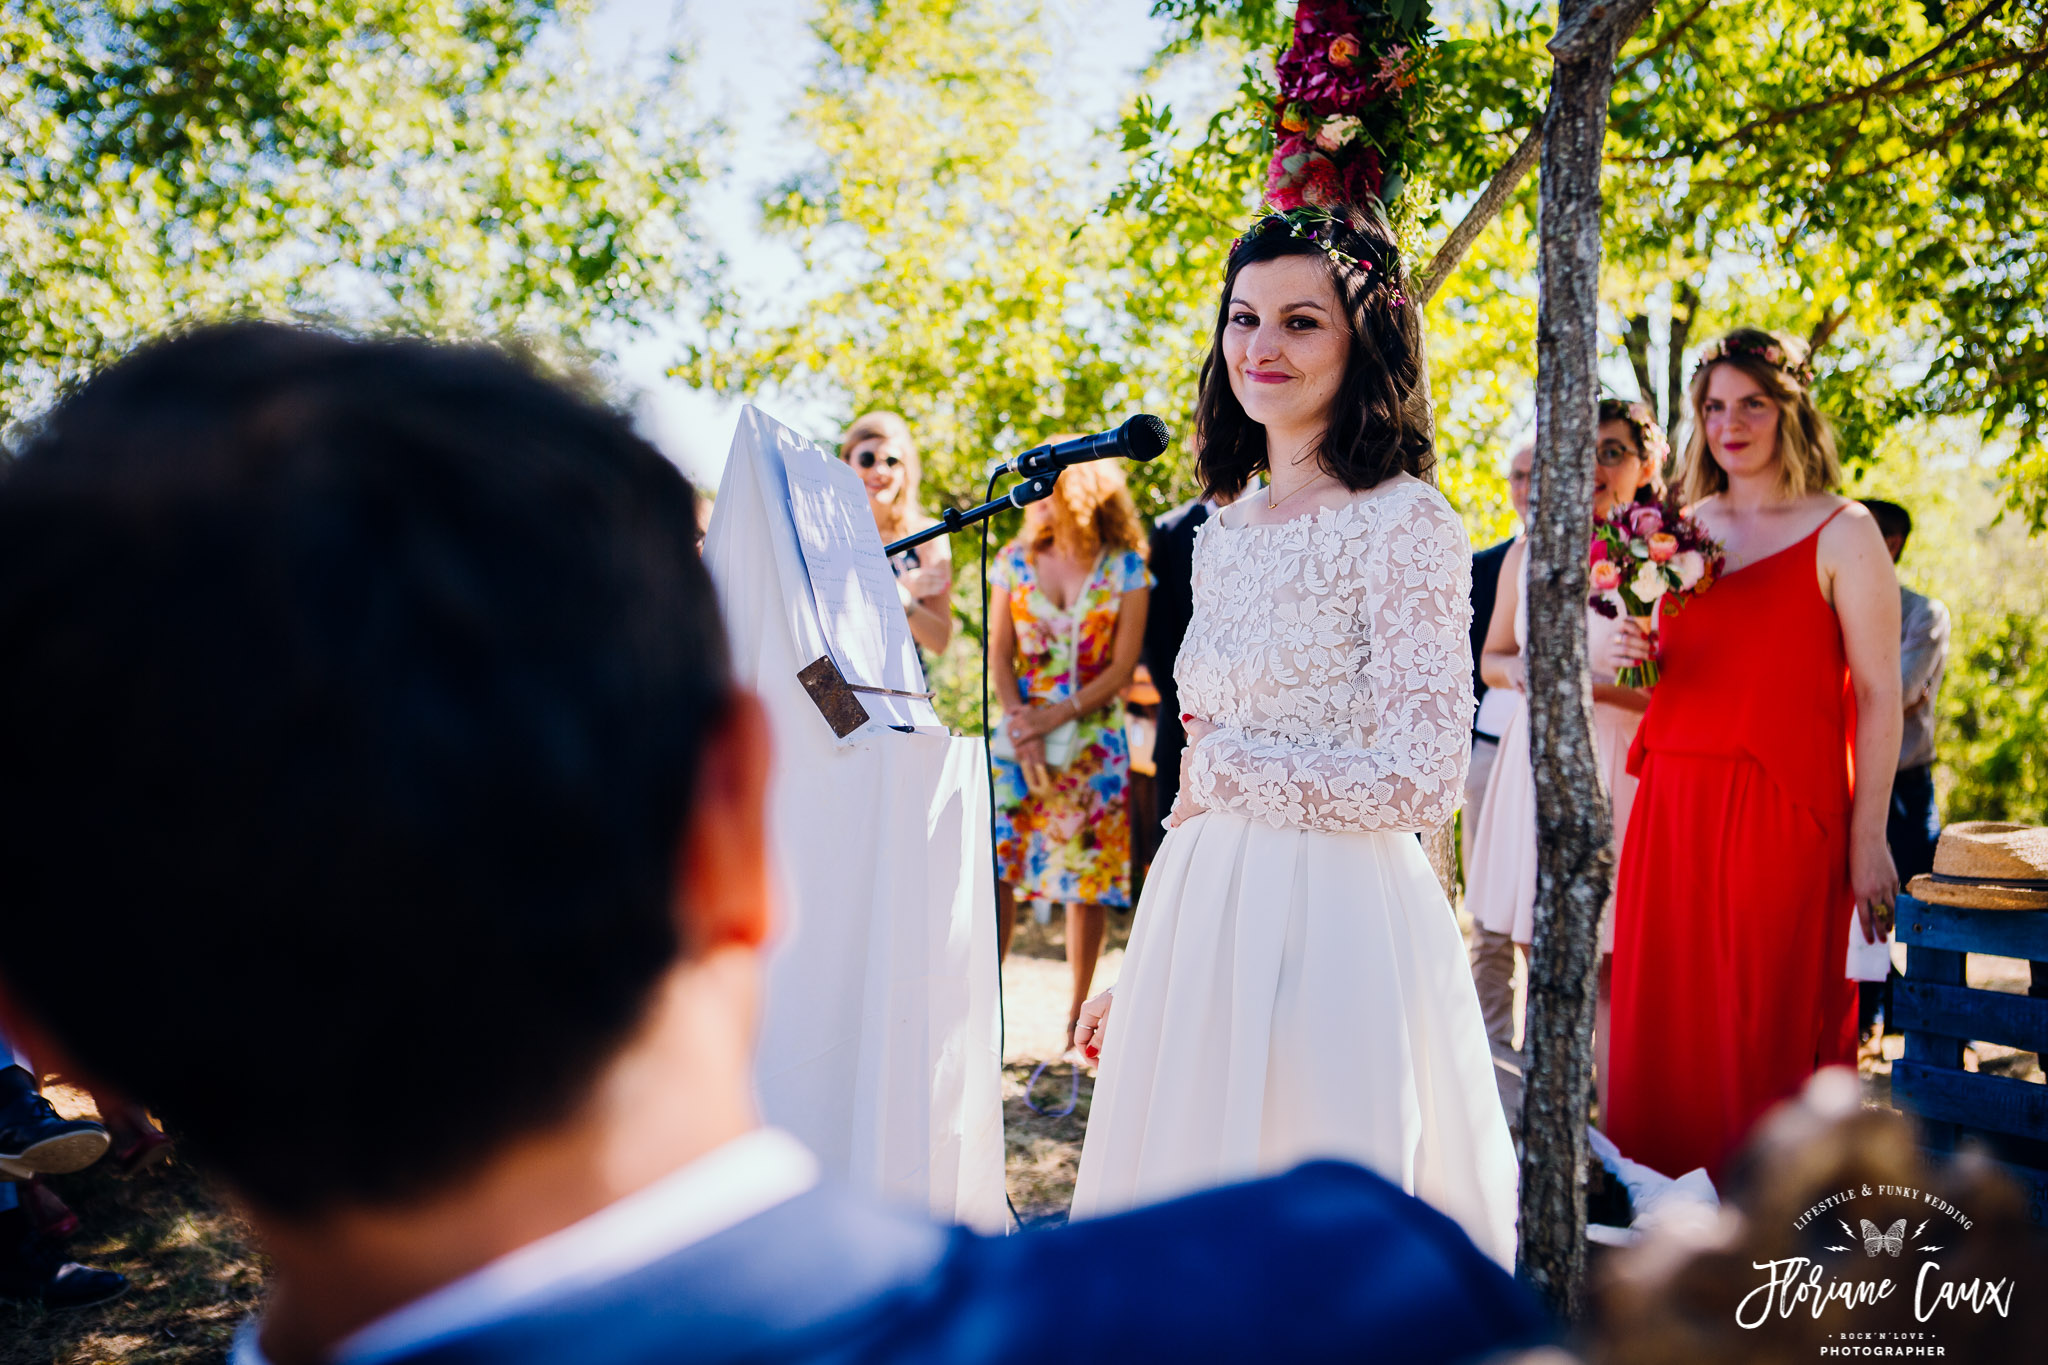 mariage-festival-cahors-ceremonie-laique-velo-licorne-4